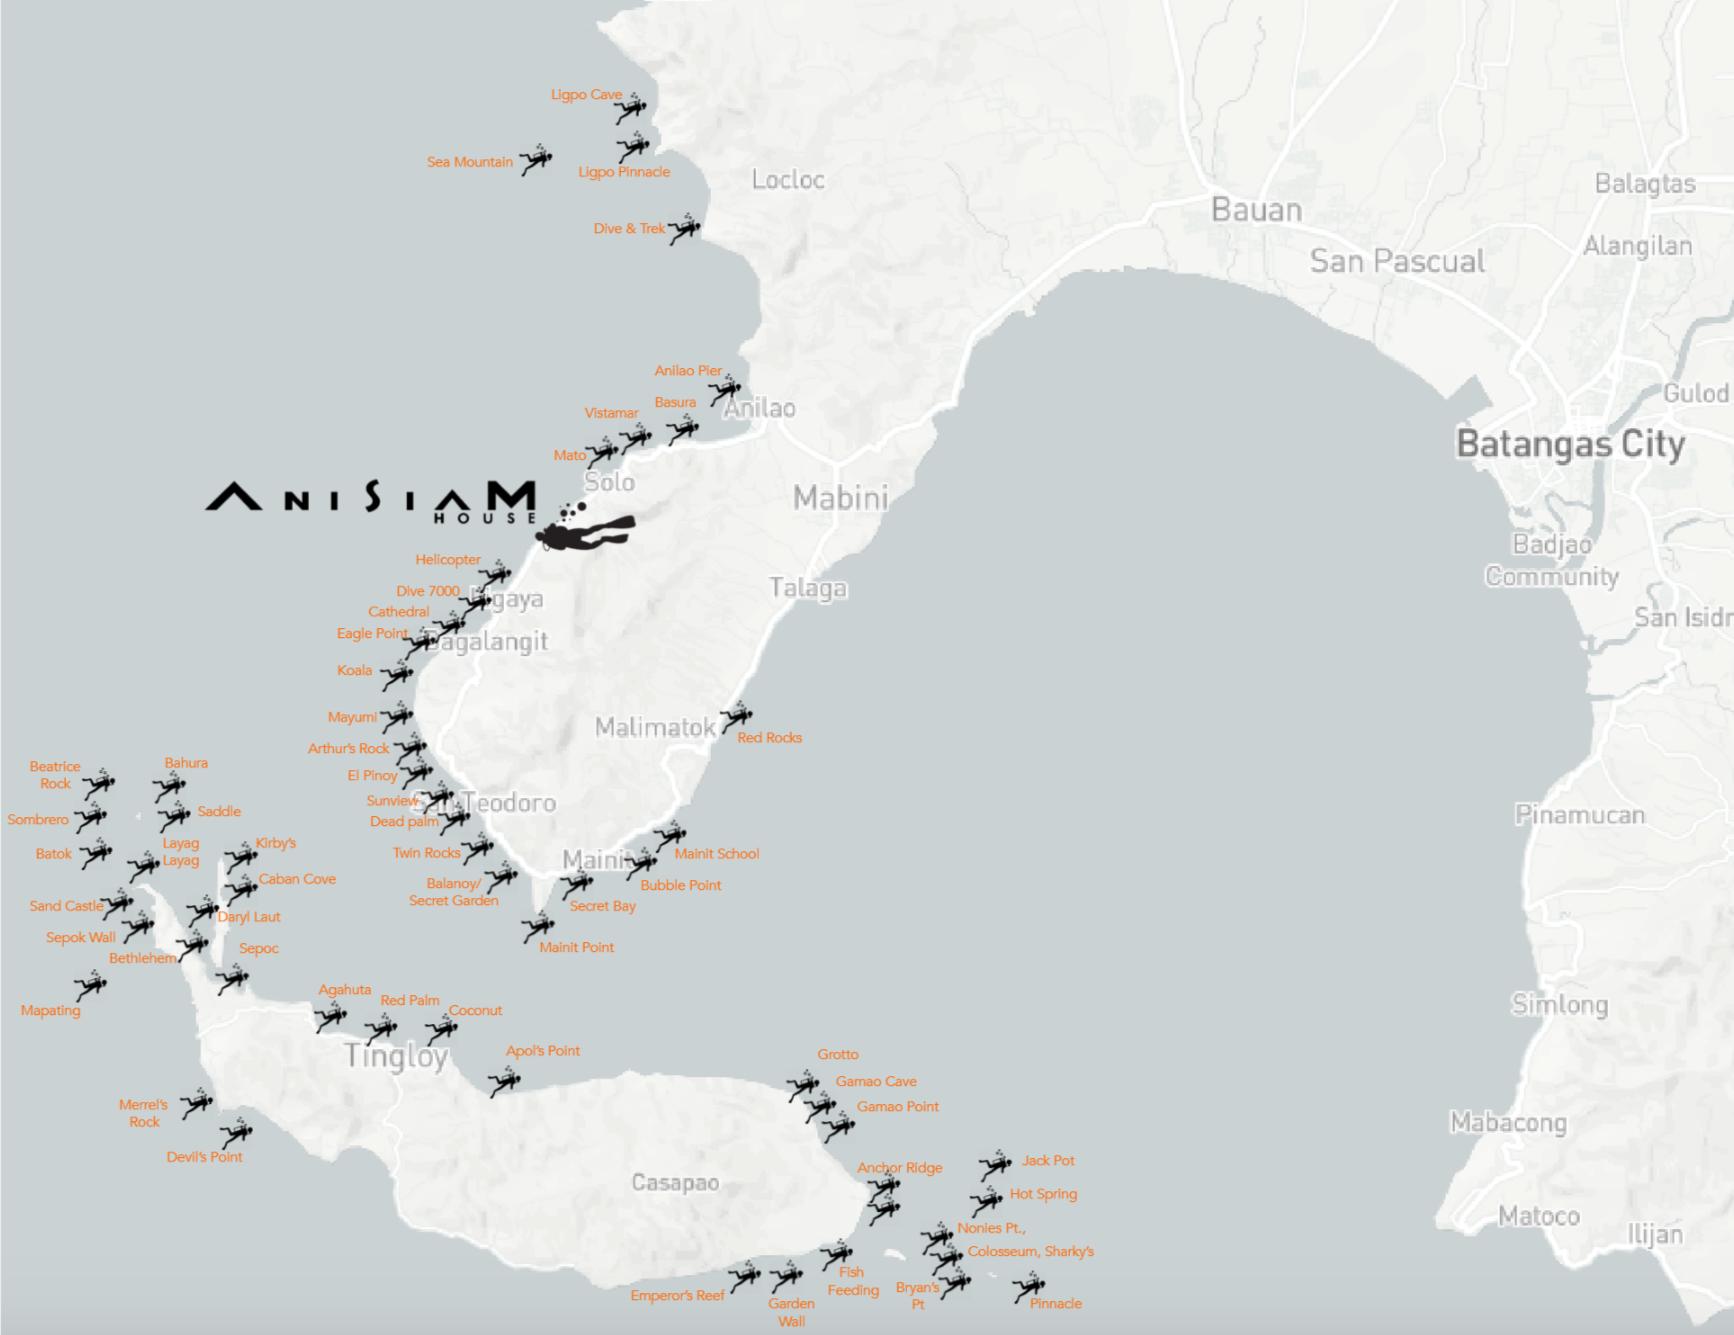 Anisiam House location & Dive-sites